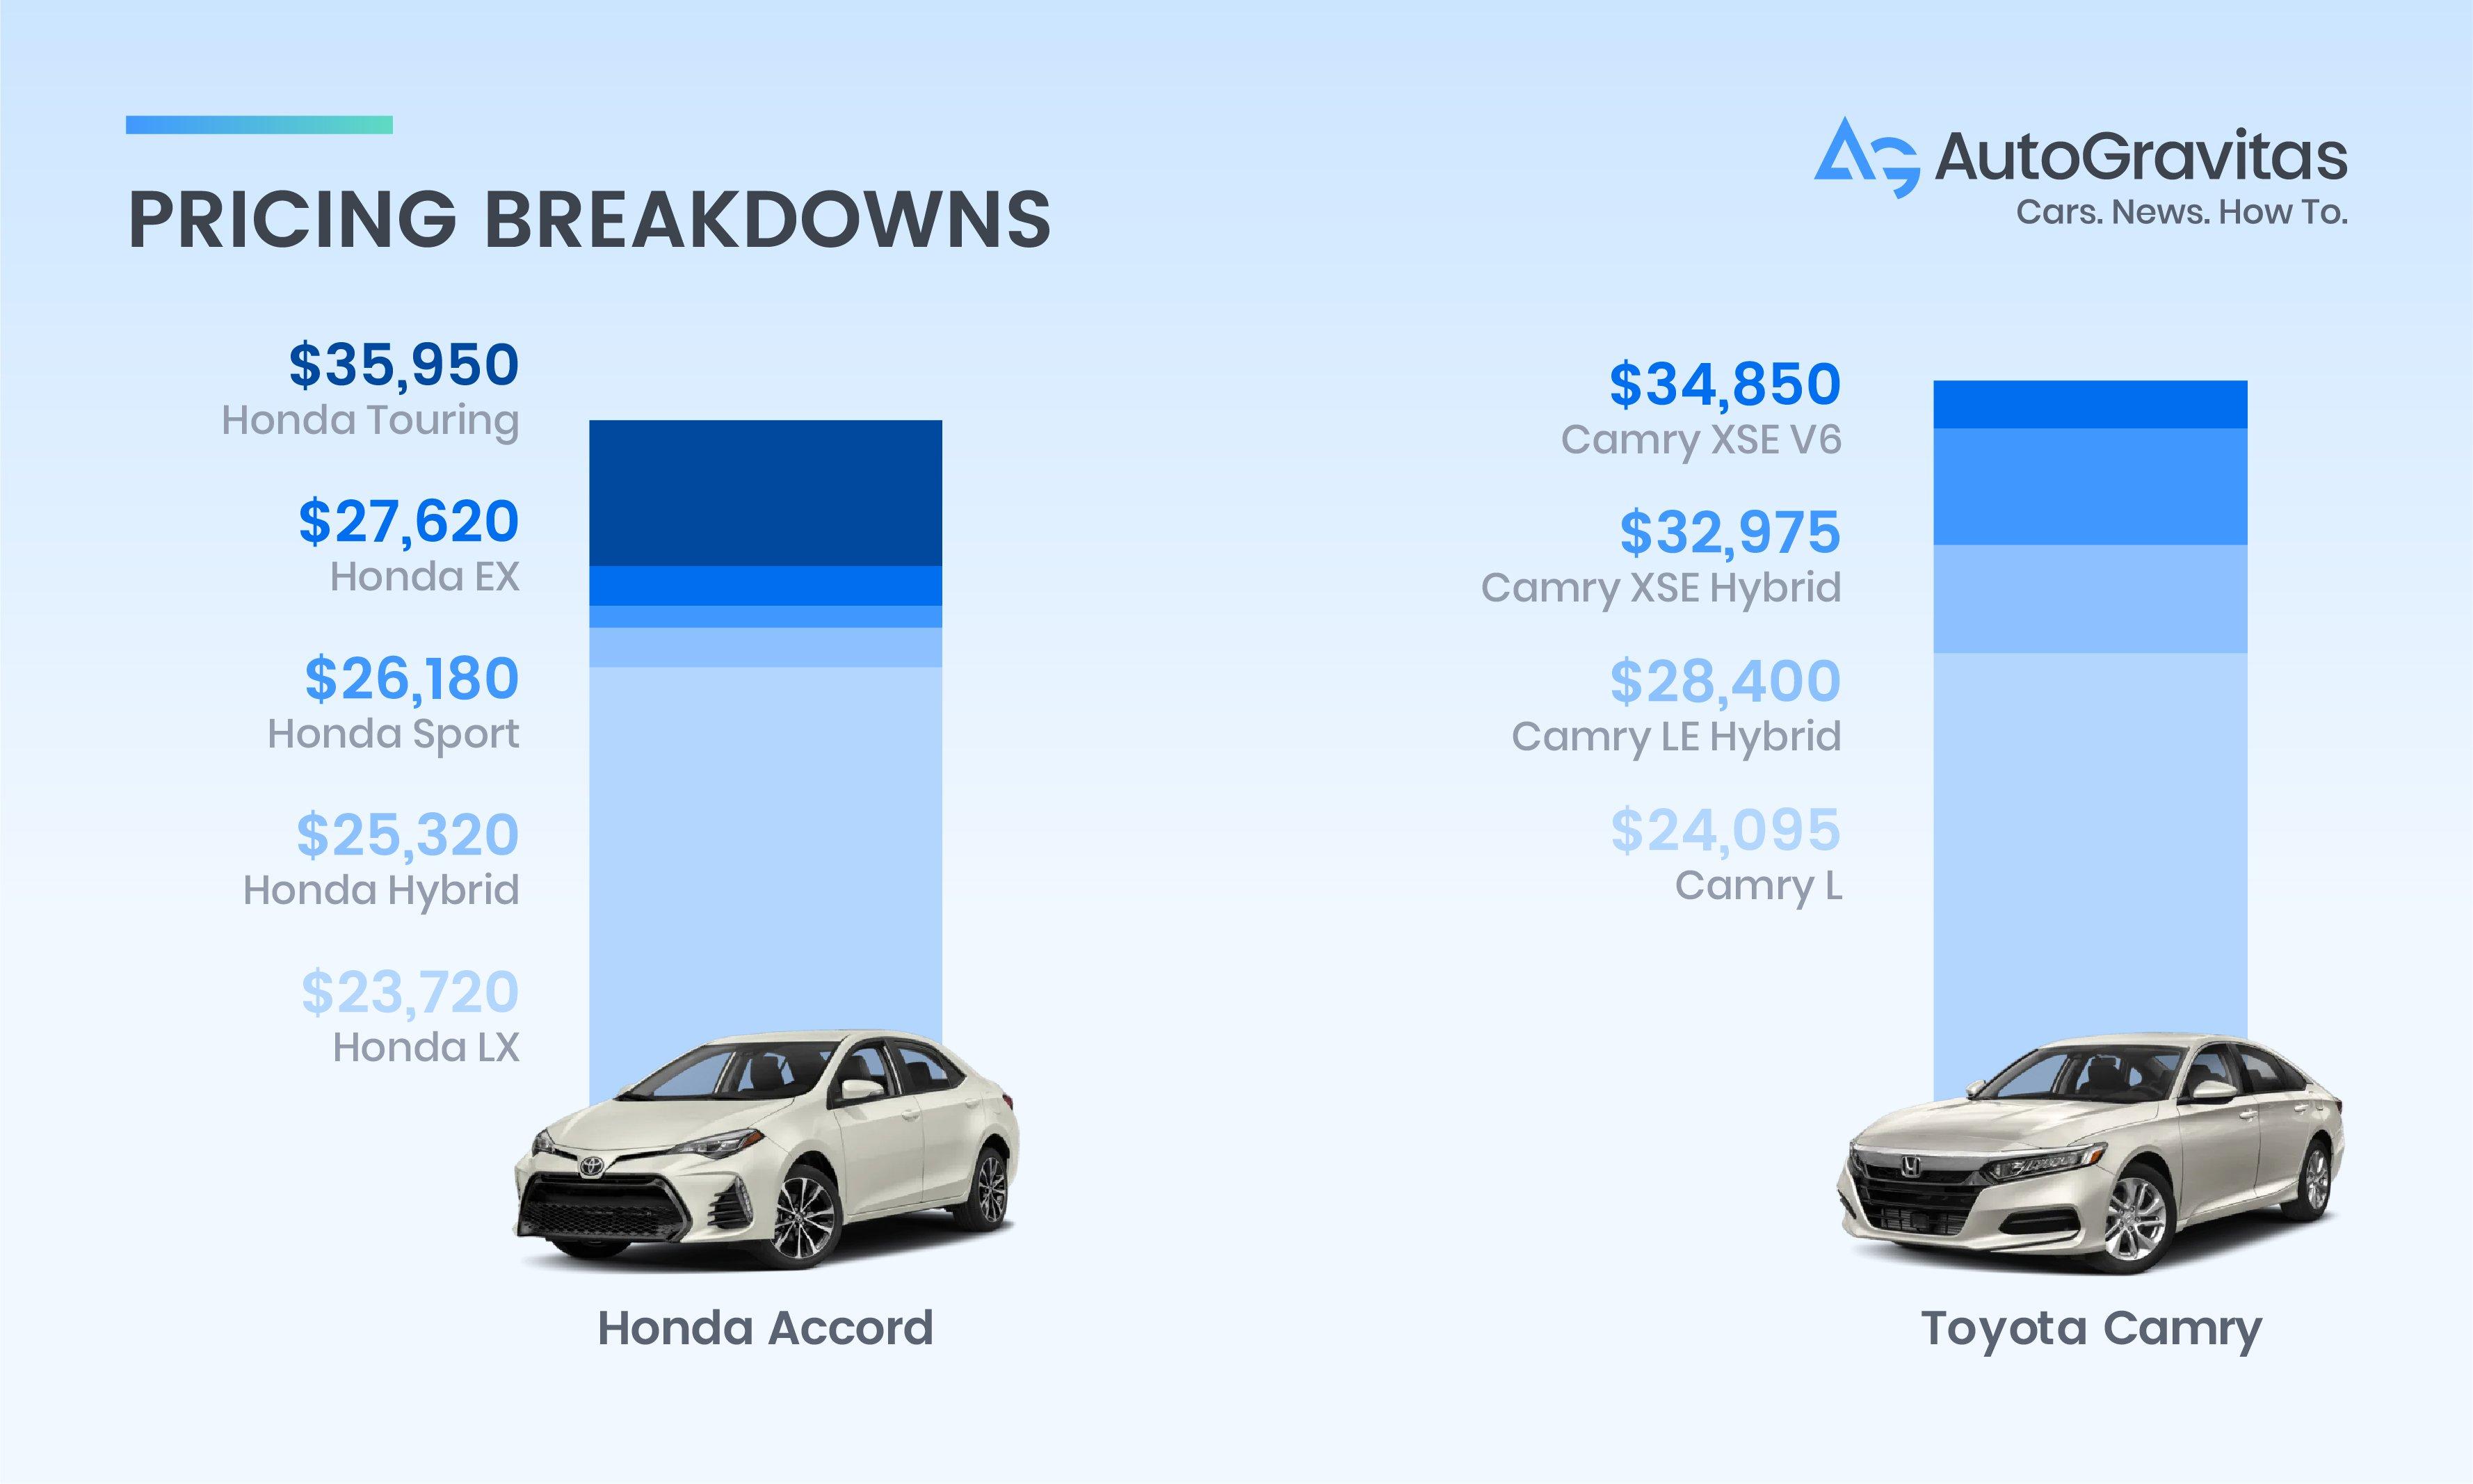 Honda pricing